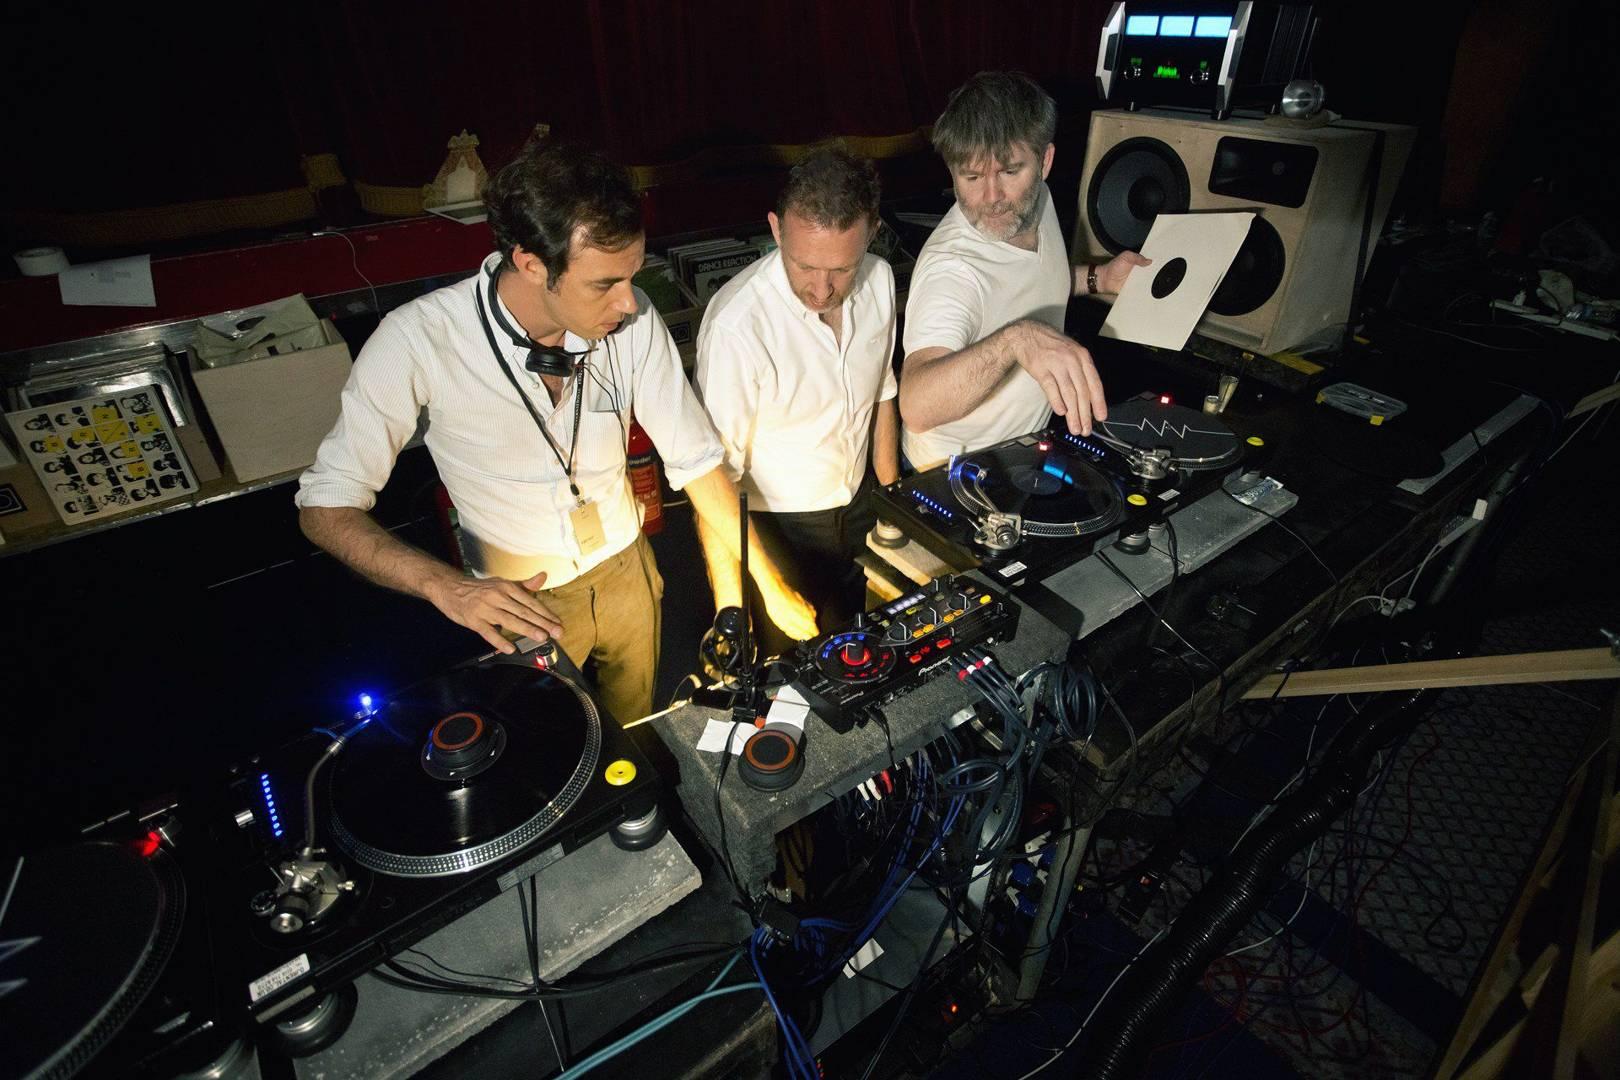 Despacio The 50000 Watt Sound System Designed For Discerning Audio Wiring Plans Nightclub Audiophiles Wired Uk